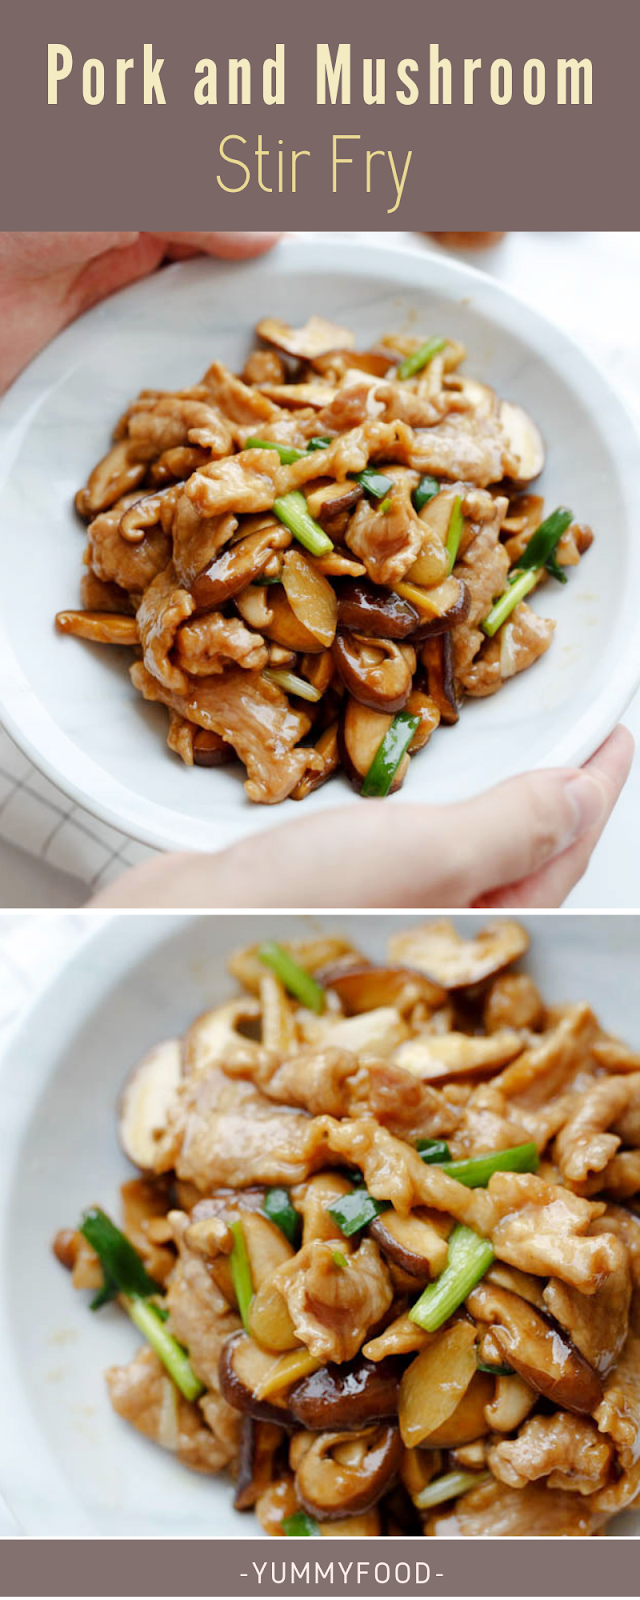 Pork and Mushroom Stir Fry